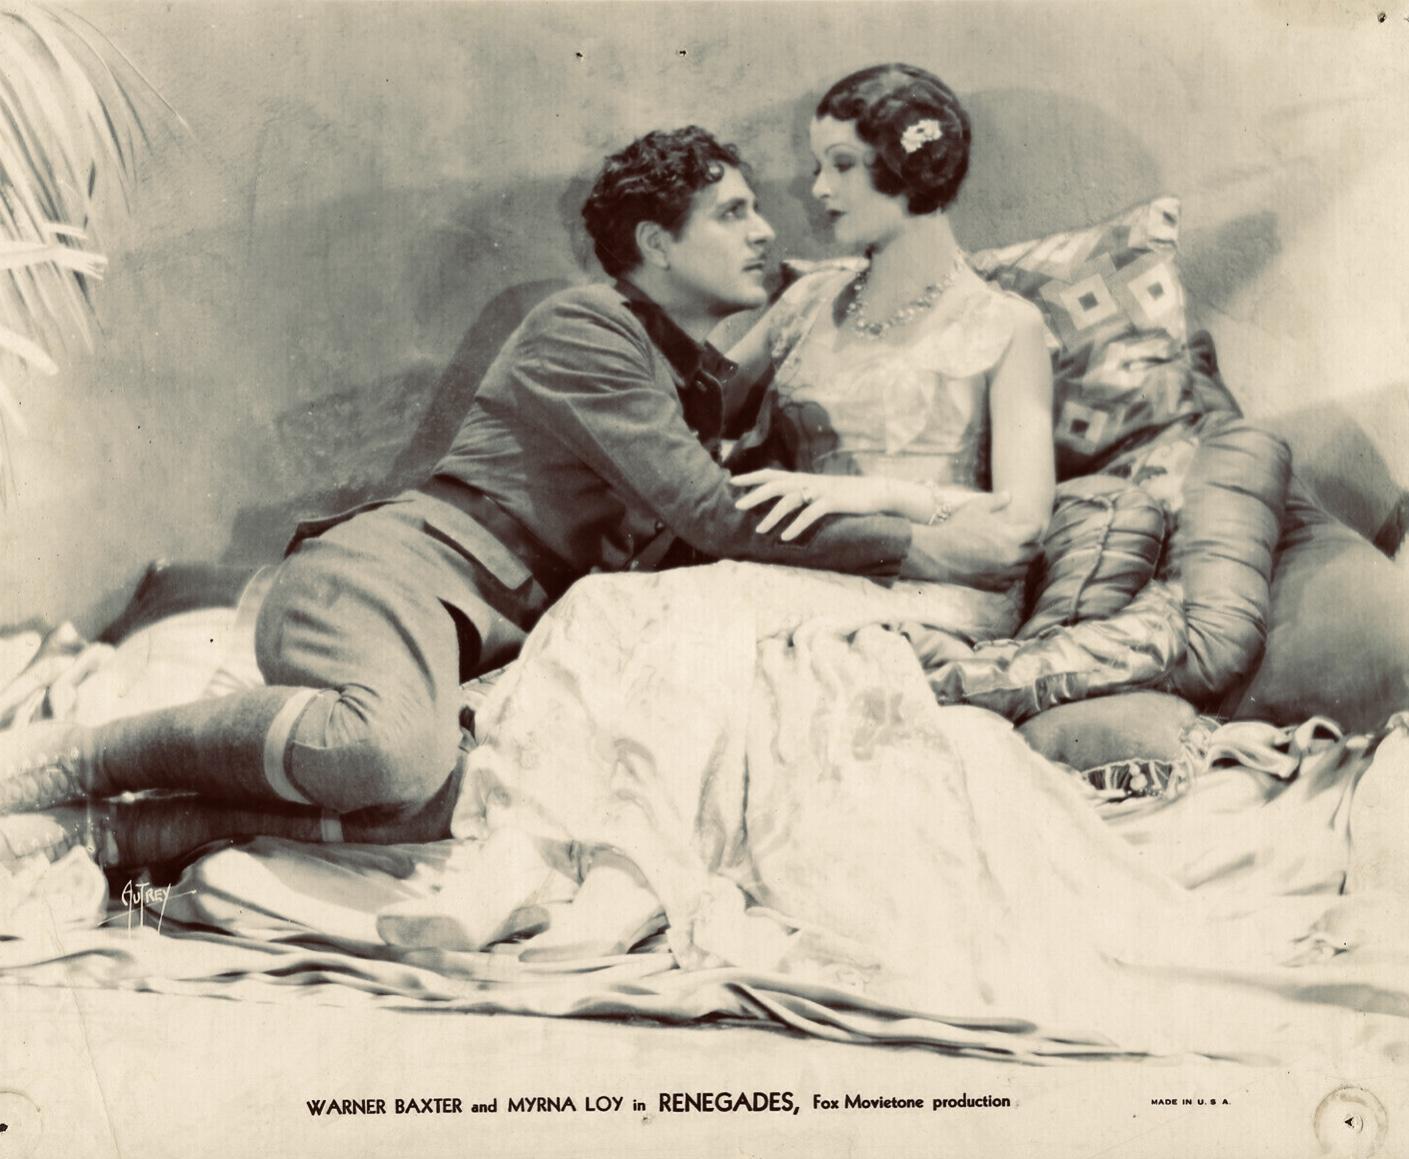 Myrna Loy and Warner Baxter in Renegades (1930)